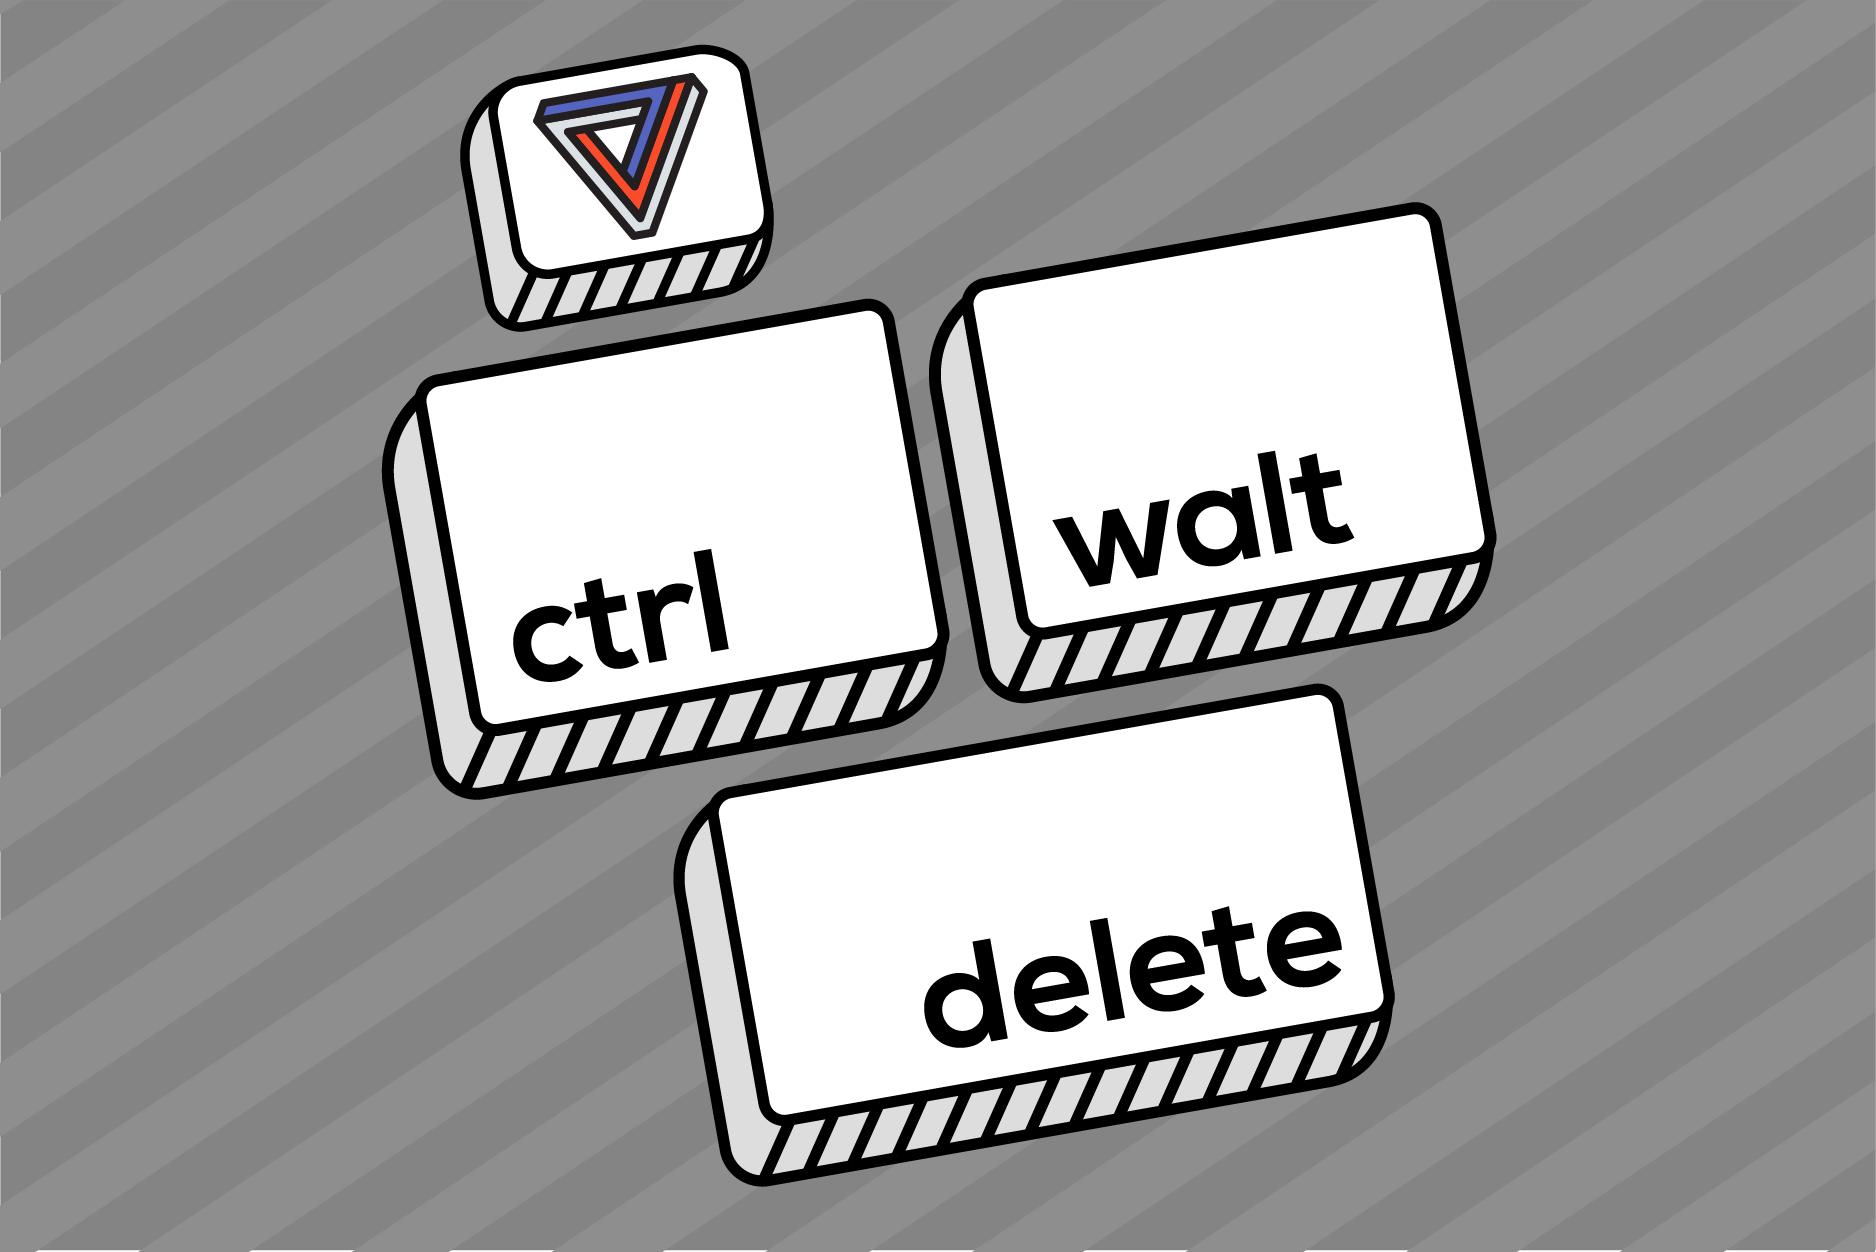 ctrl-walt-delete-logo-wider